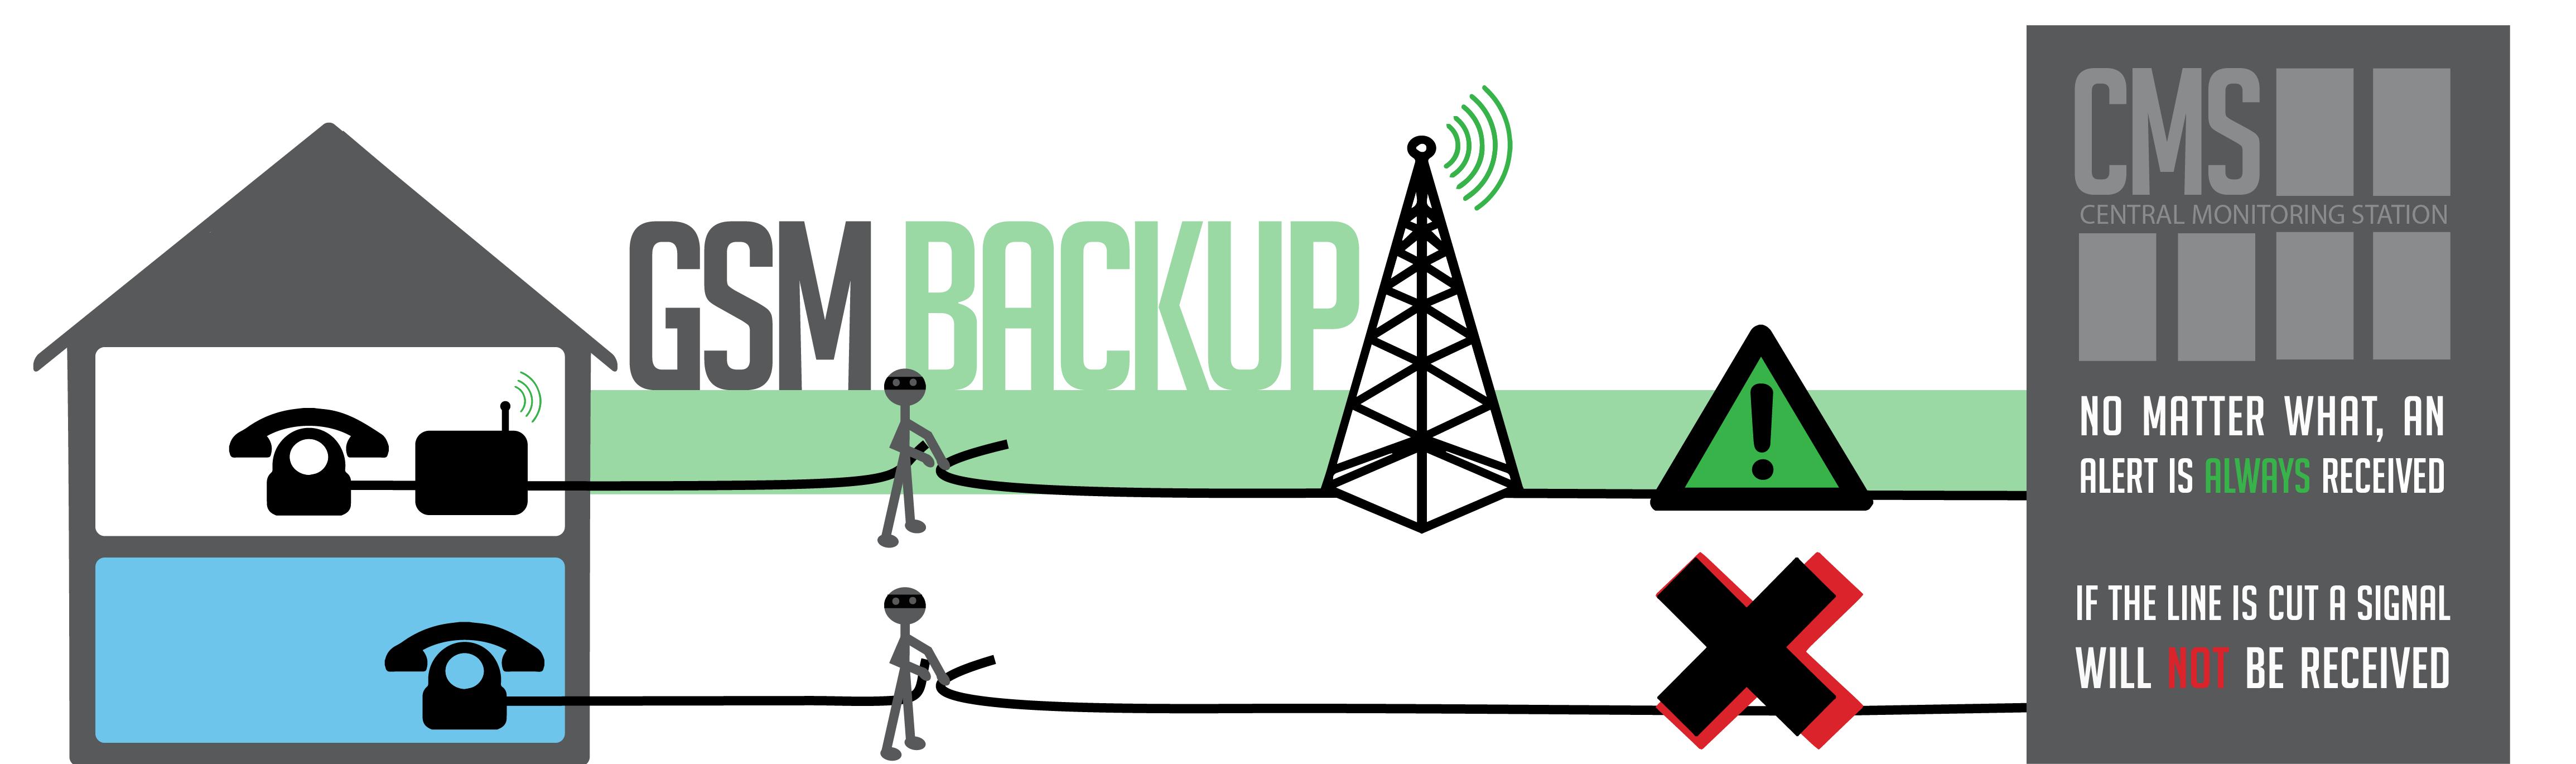 GSM backup infographic